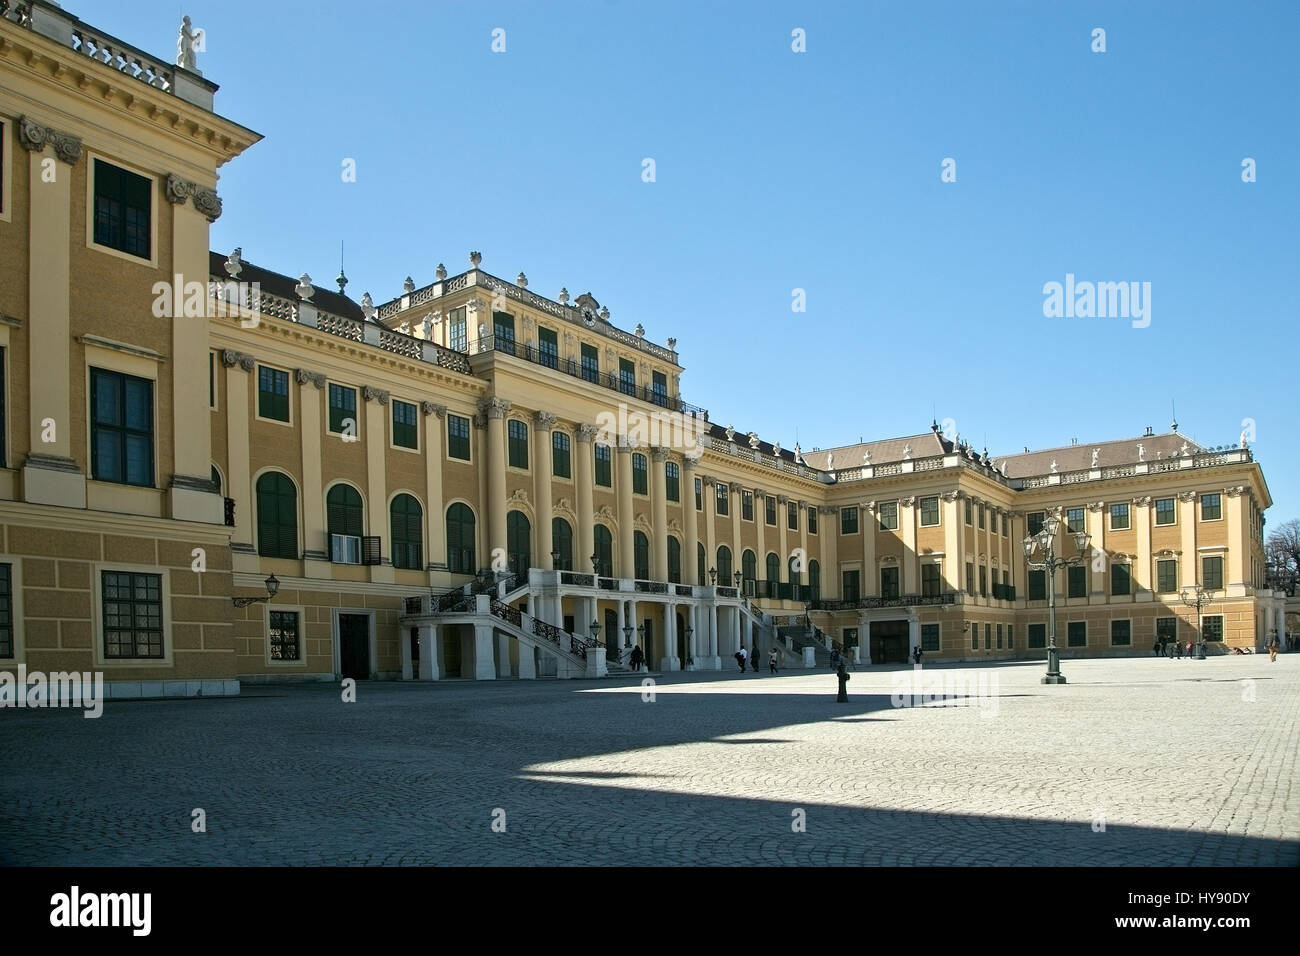 Schonbrunn Palace, Vienna. - Stock Image